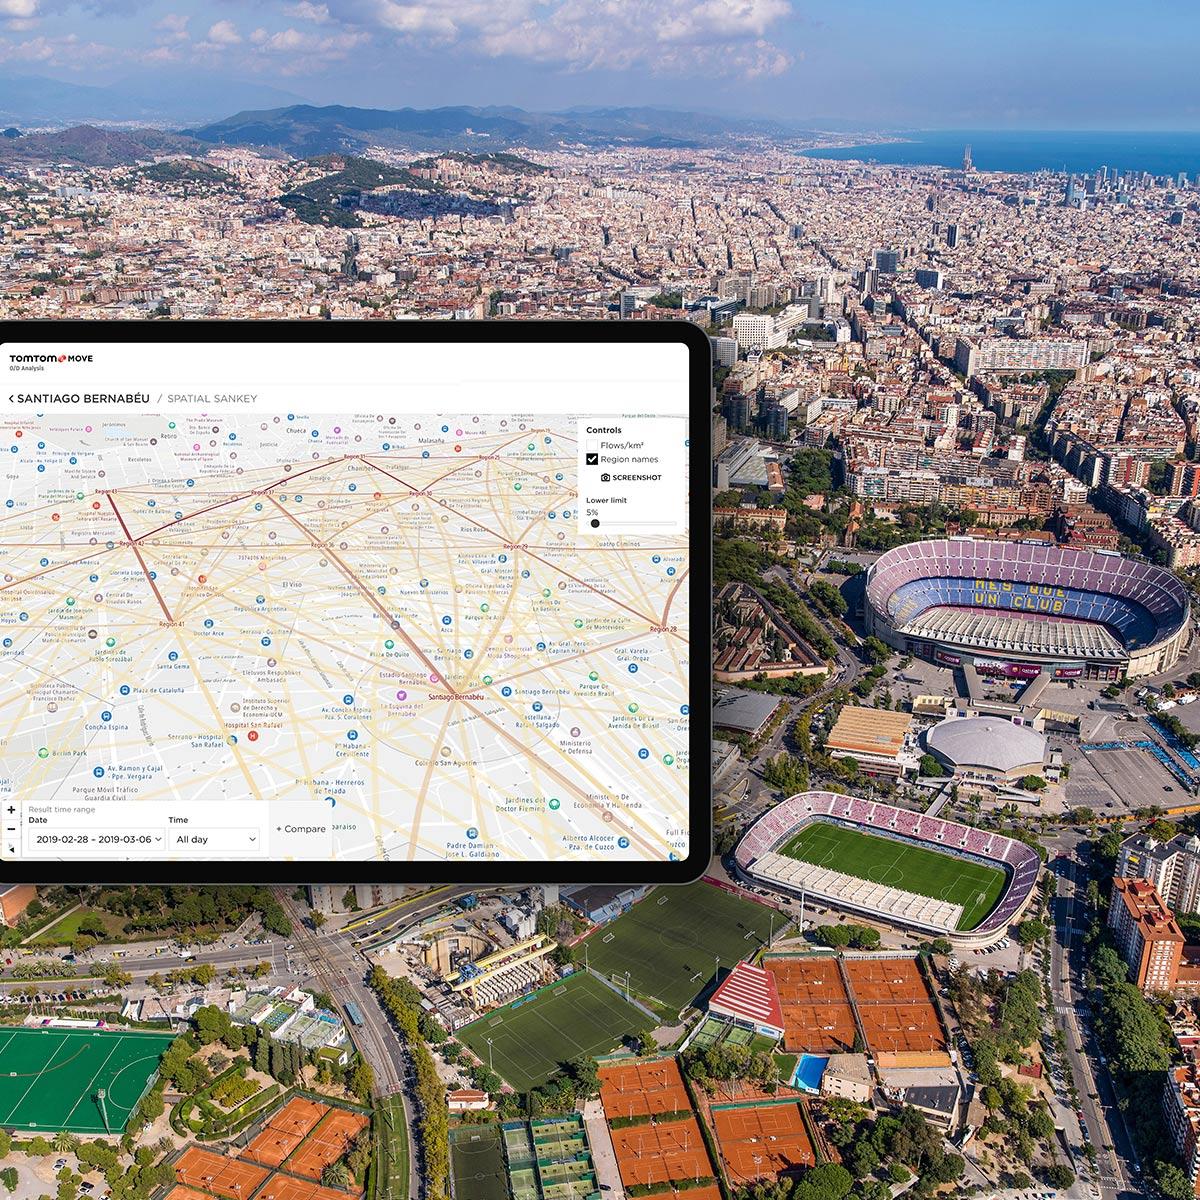 Improve urban planning